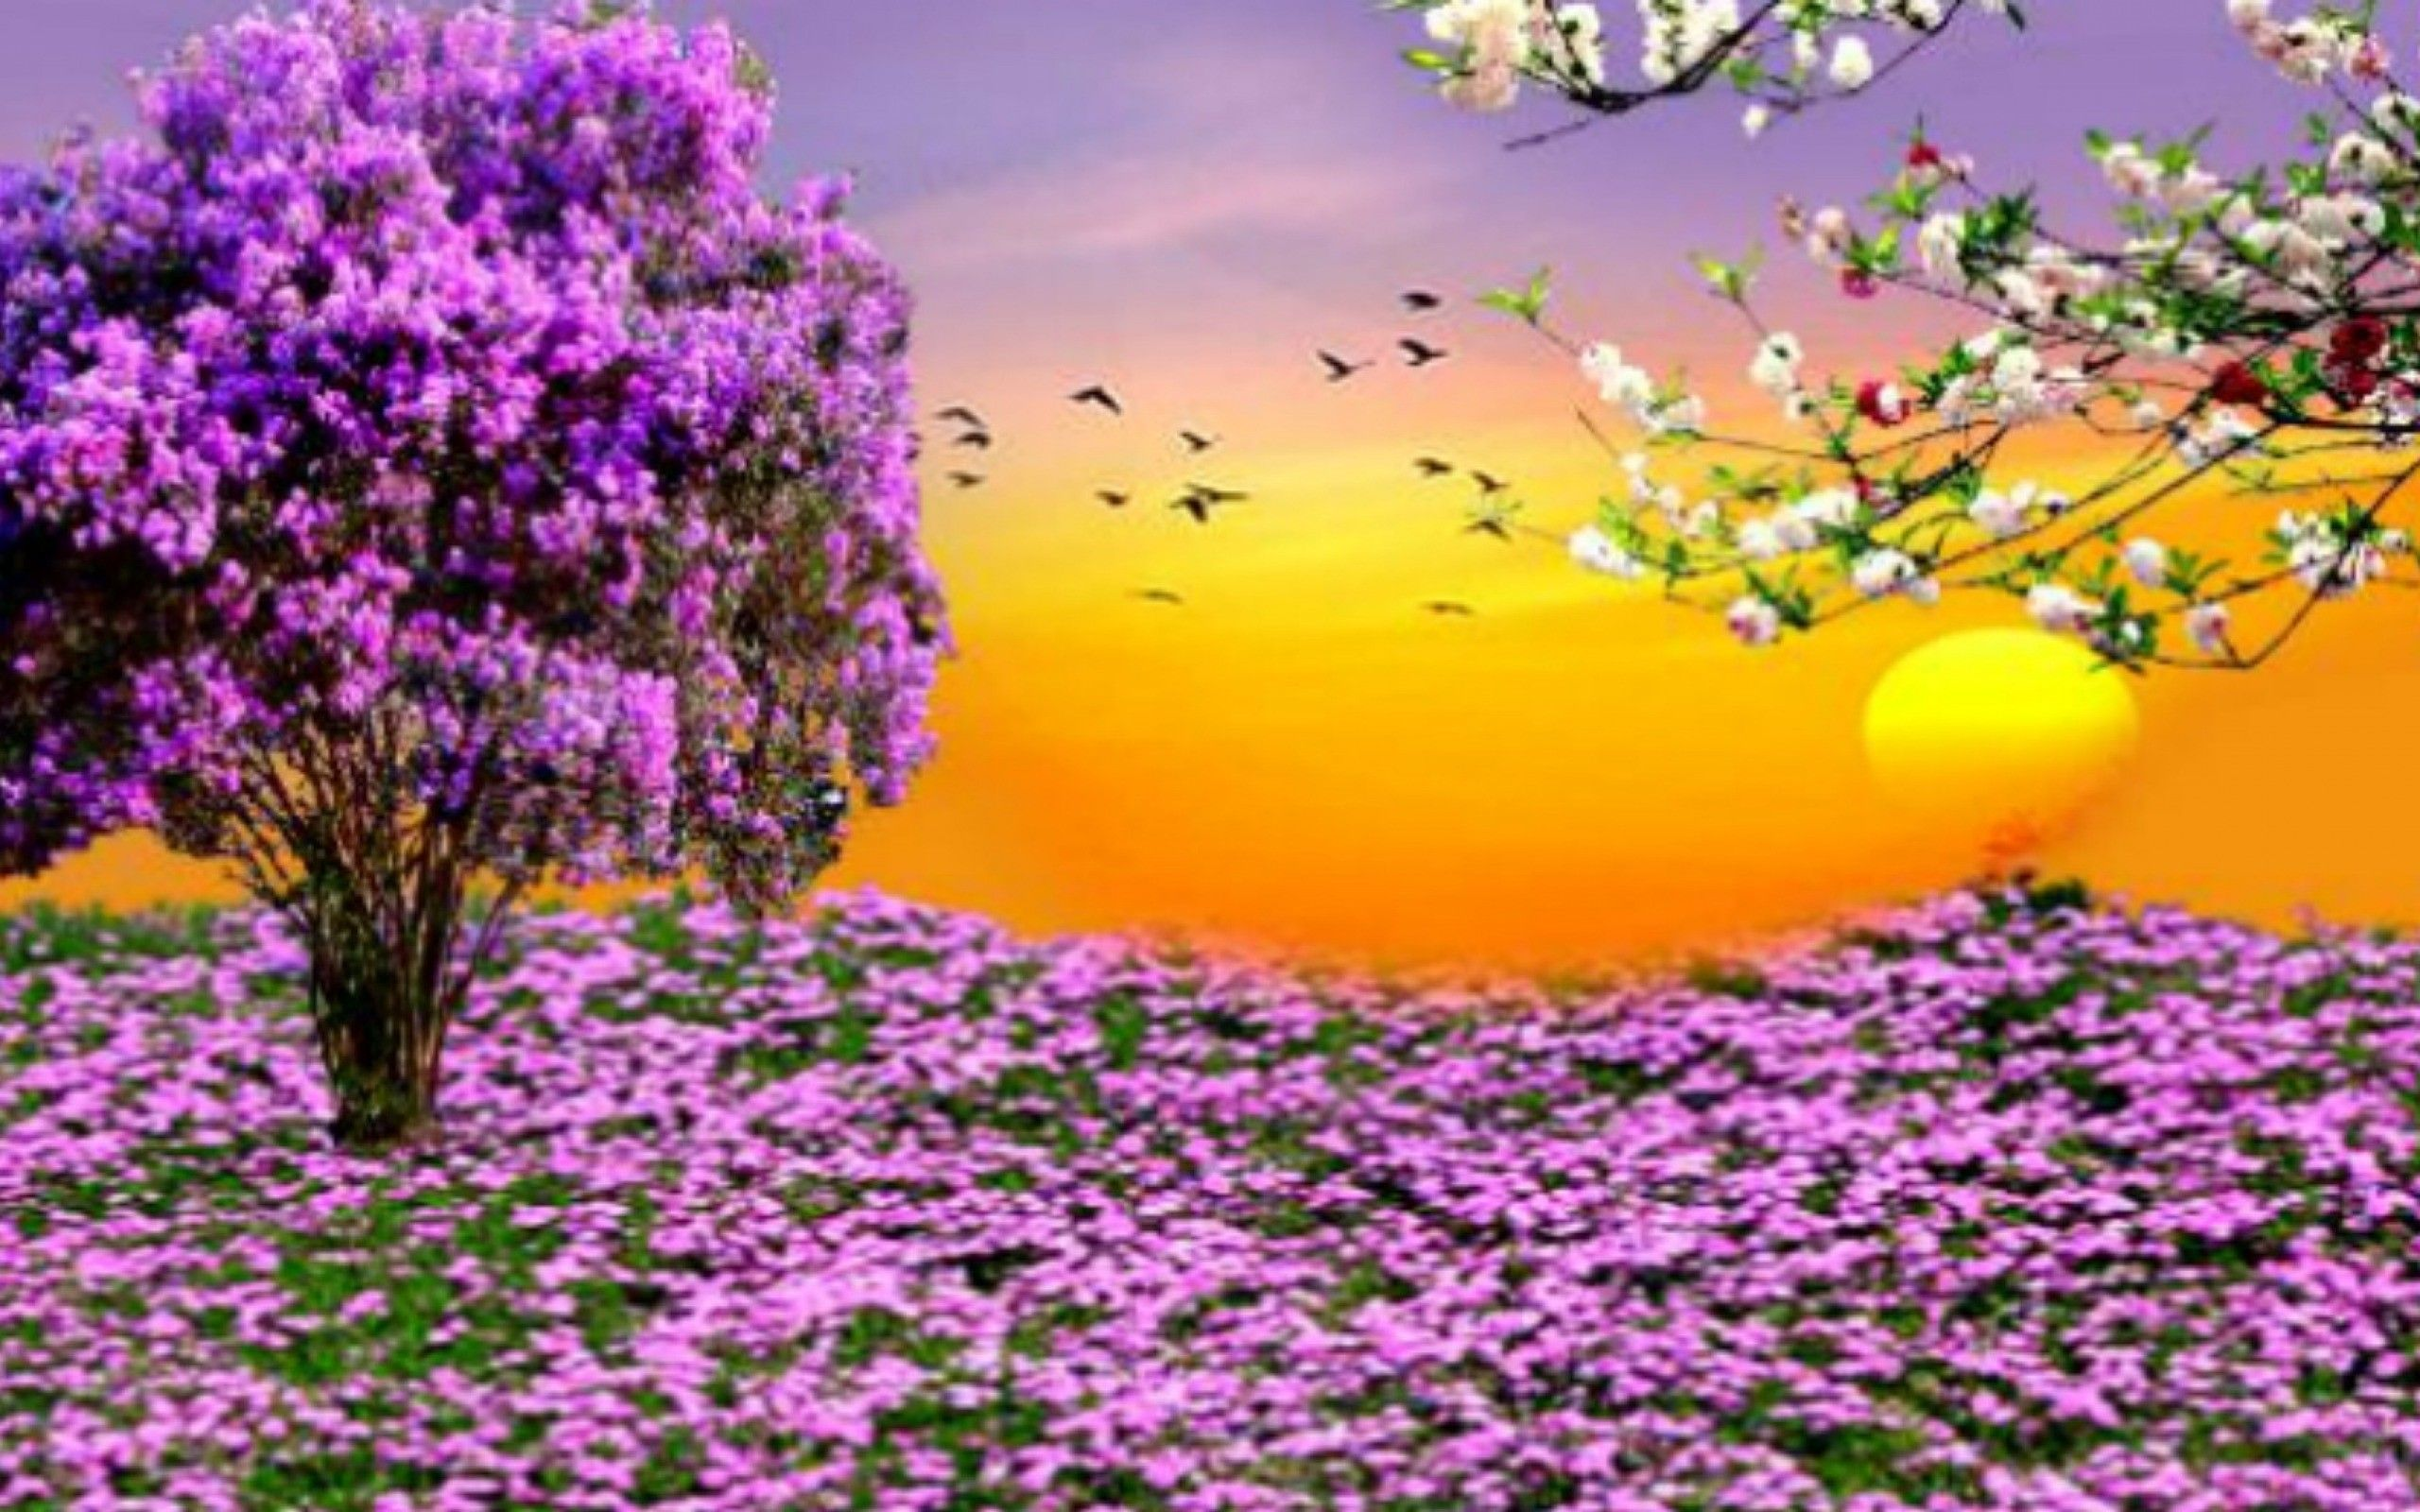 Spring Flowers Download Yahoo Image Search Results Spring Desktop Wallpaper Spring Landscape Photos Spring Wallpaper